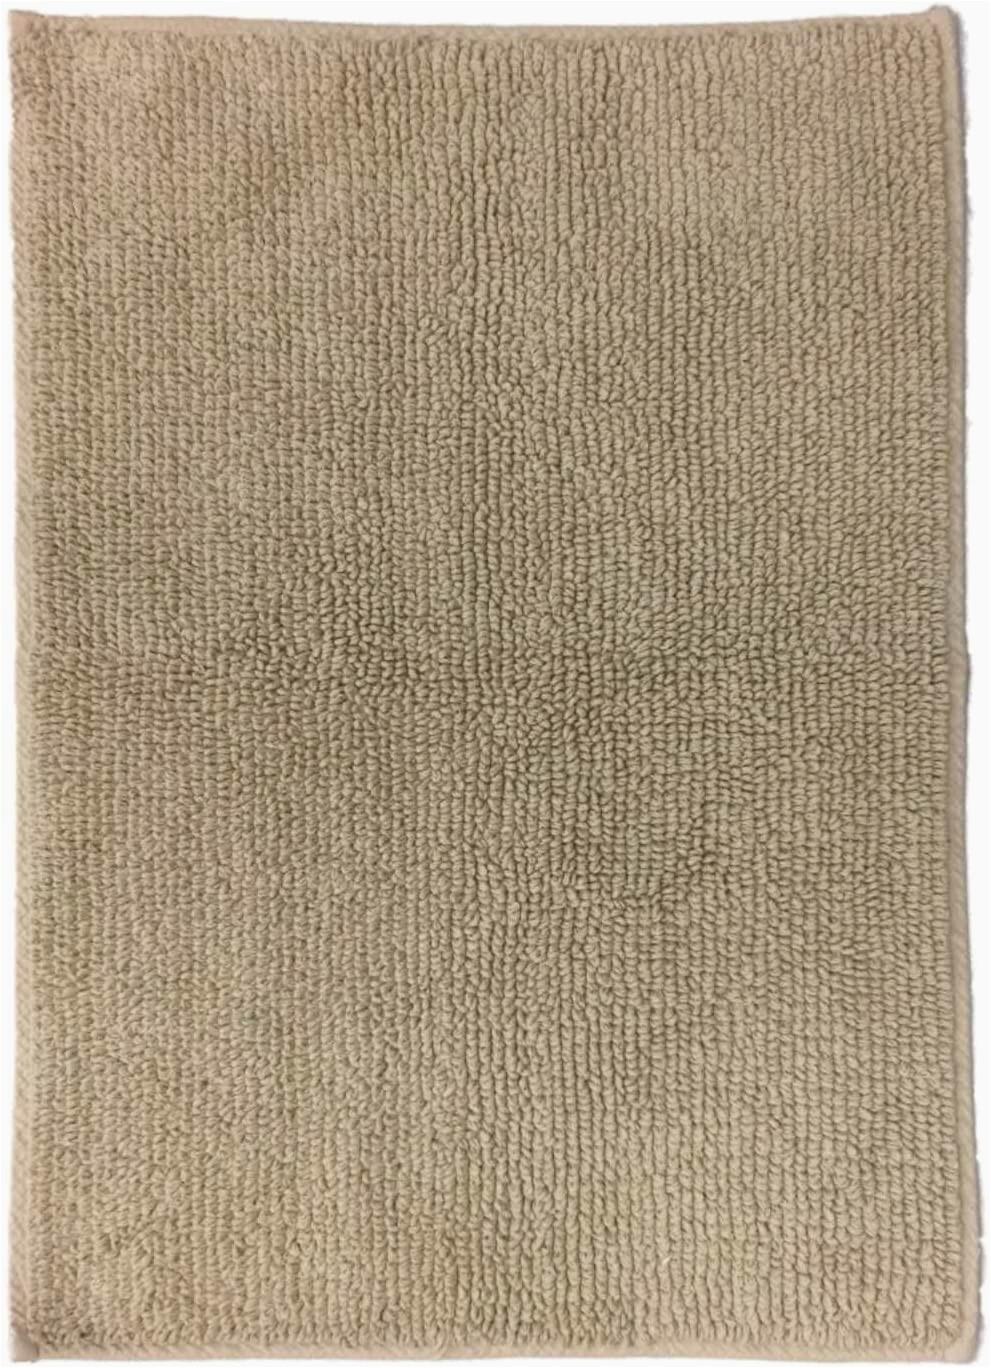 Sonoma Cotton Bath Rugs Amazon Reversible solid Tan Plush Pile Throw Rug 20×32